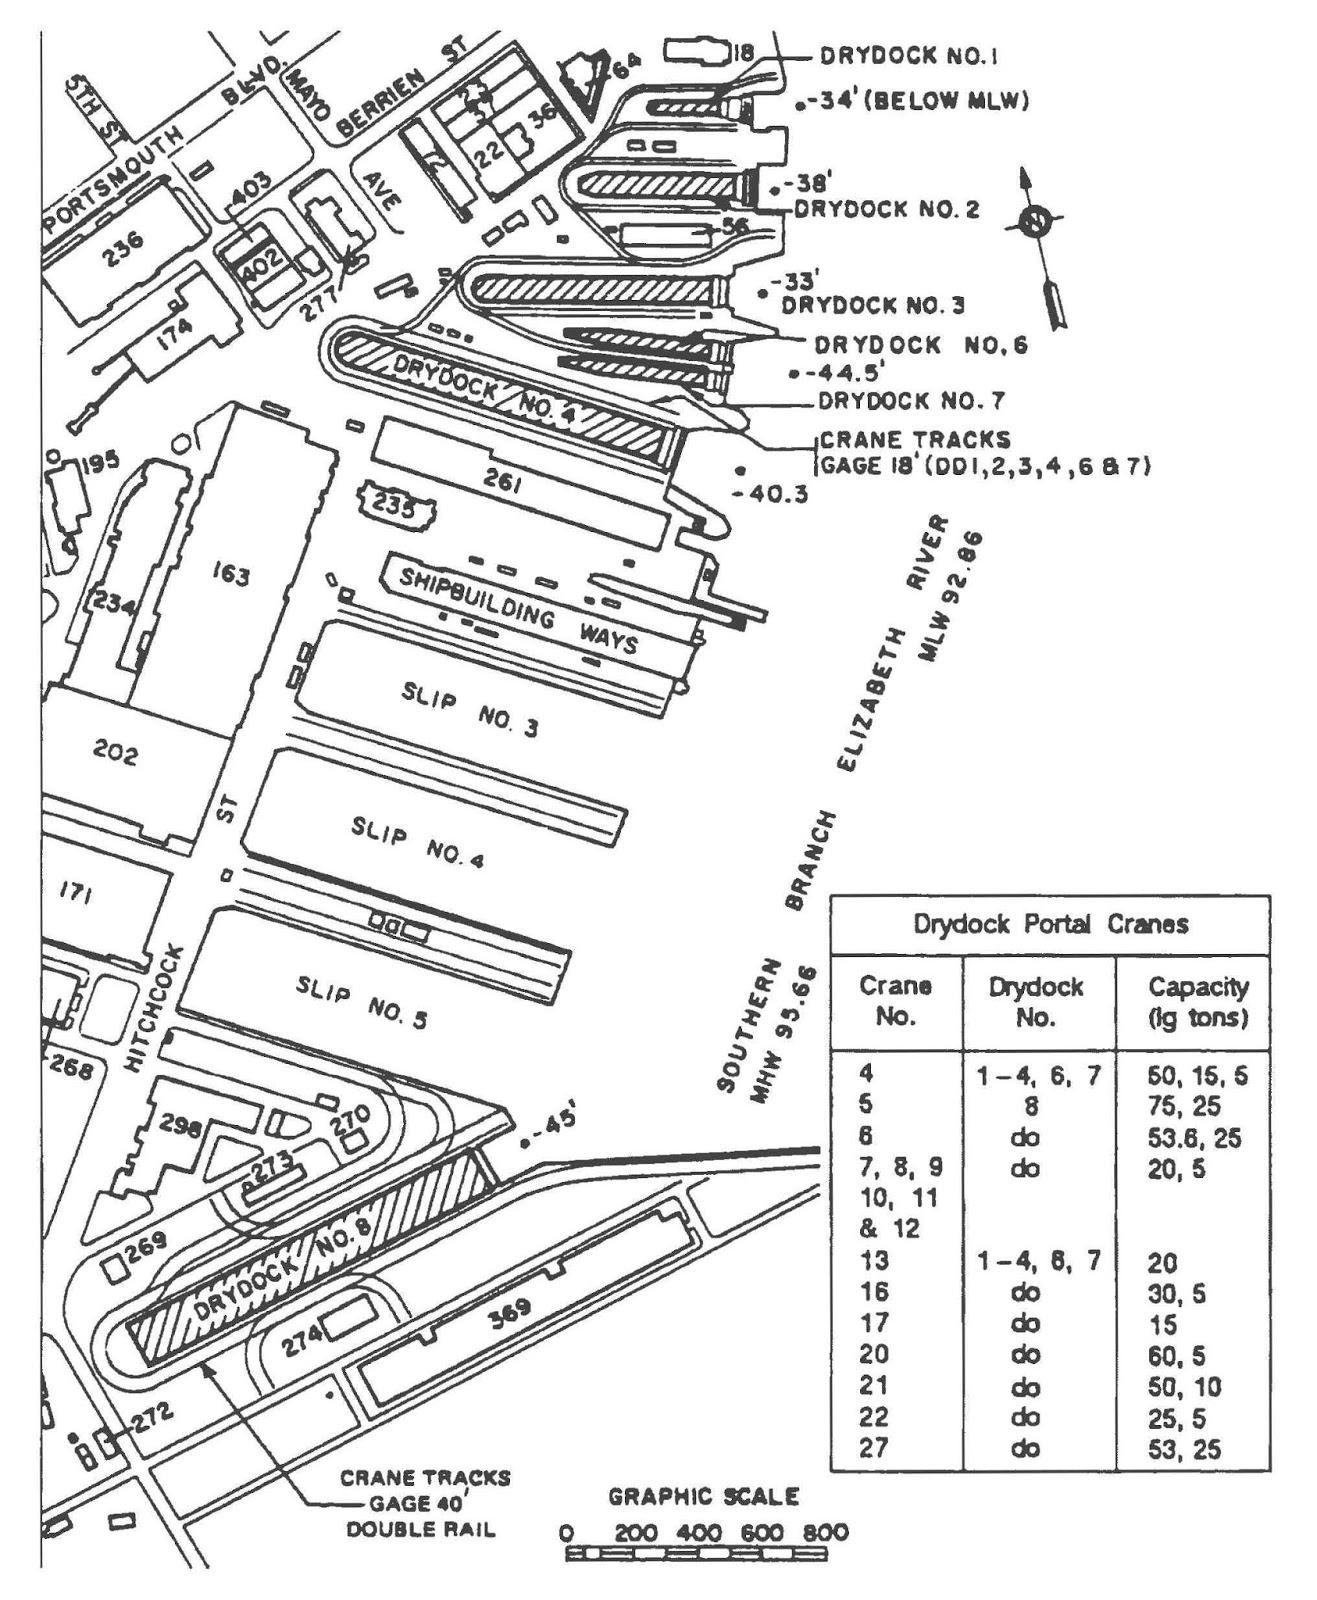 hampton roads naval museum historic gems norfolk naval shipyard s semi truck loading dock dimensions dry dock diagram [ 1317 x 1600 Pixel ]